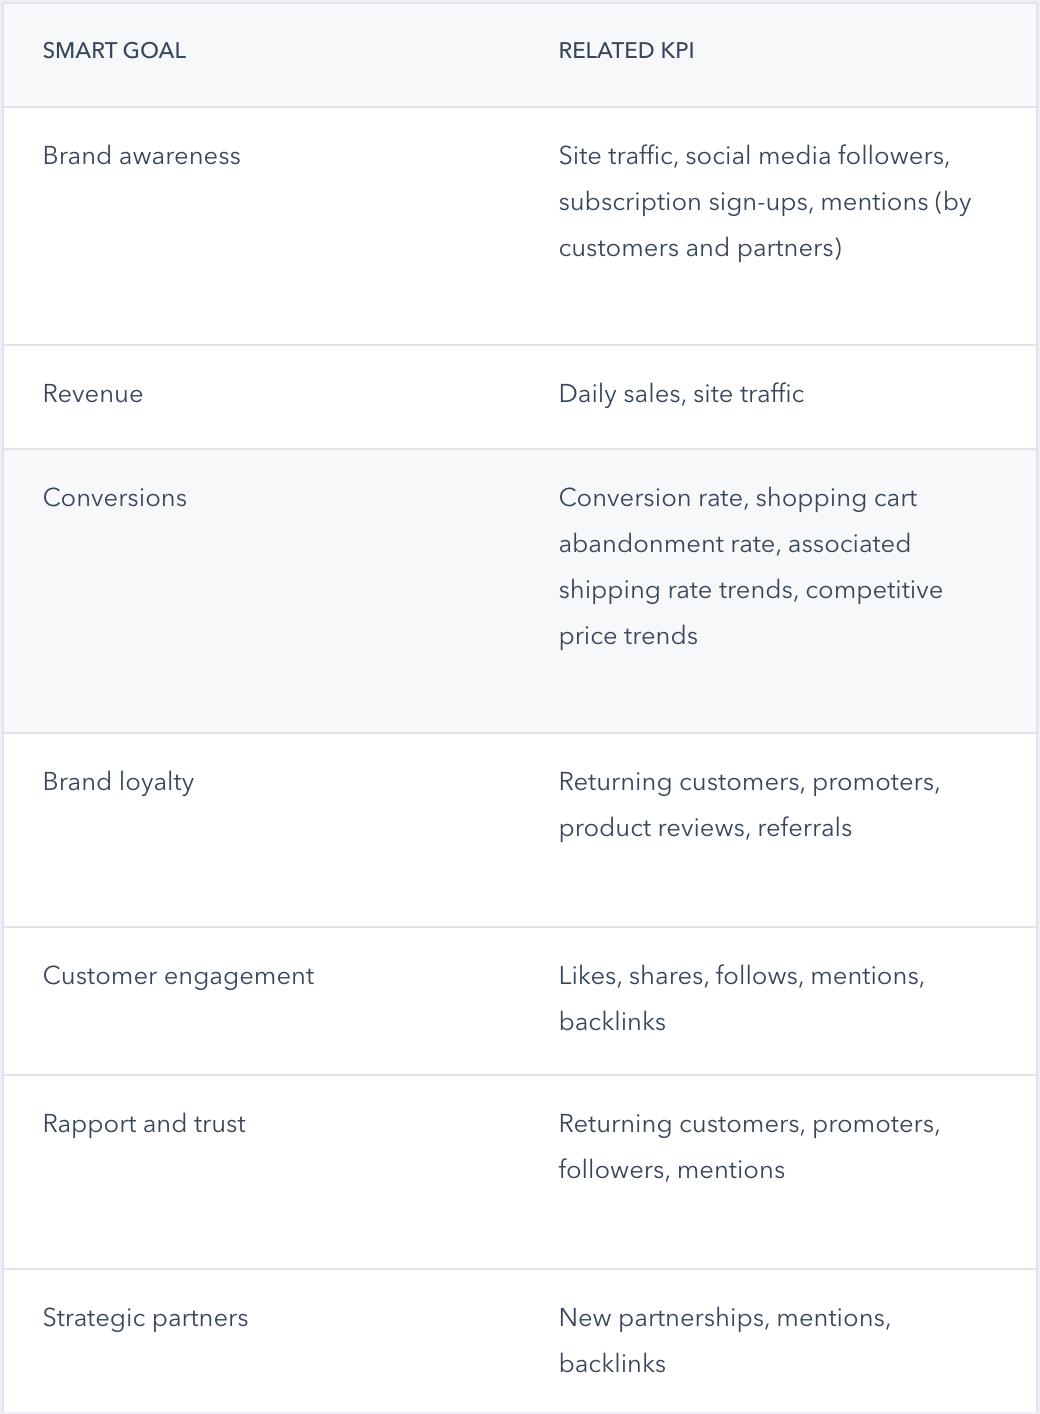 content-marketing-kpi-hubspot